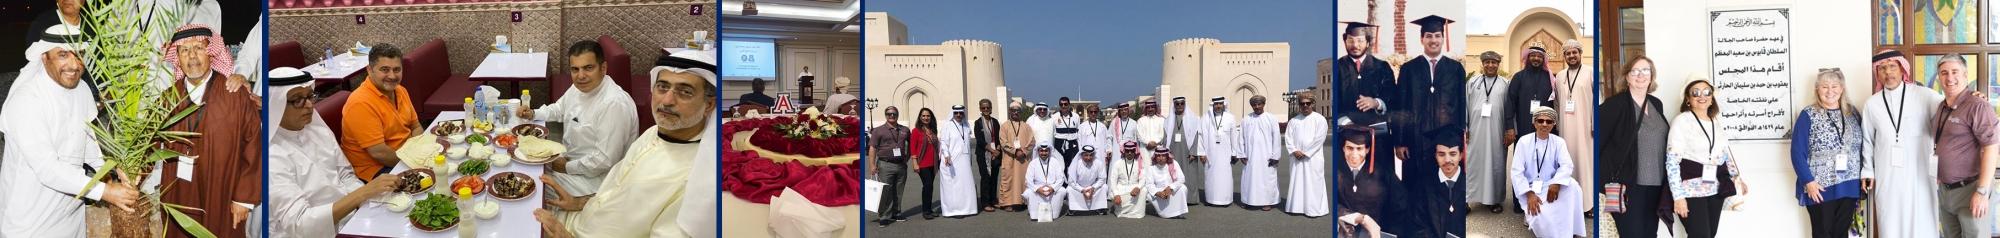 Gulf Cooperation Council - UA Oman Reunion 2020